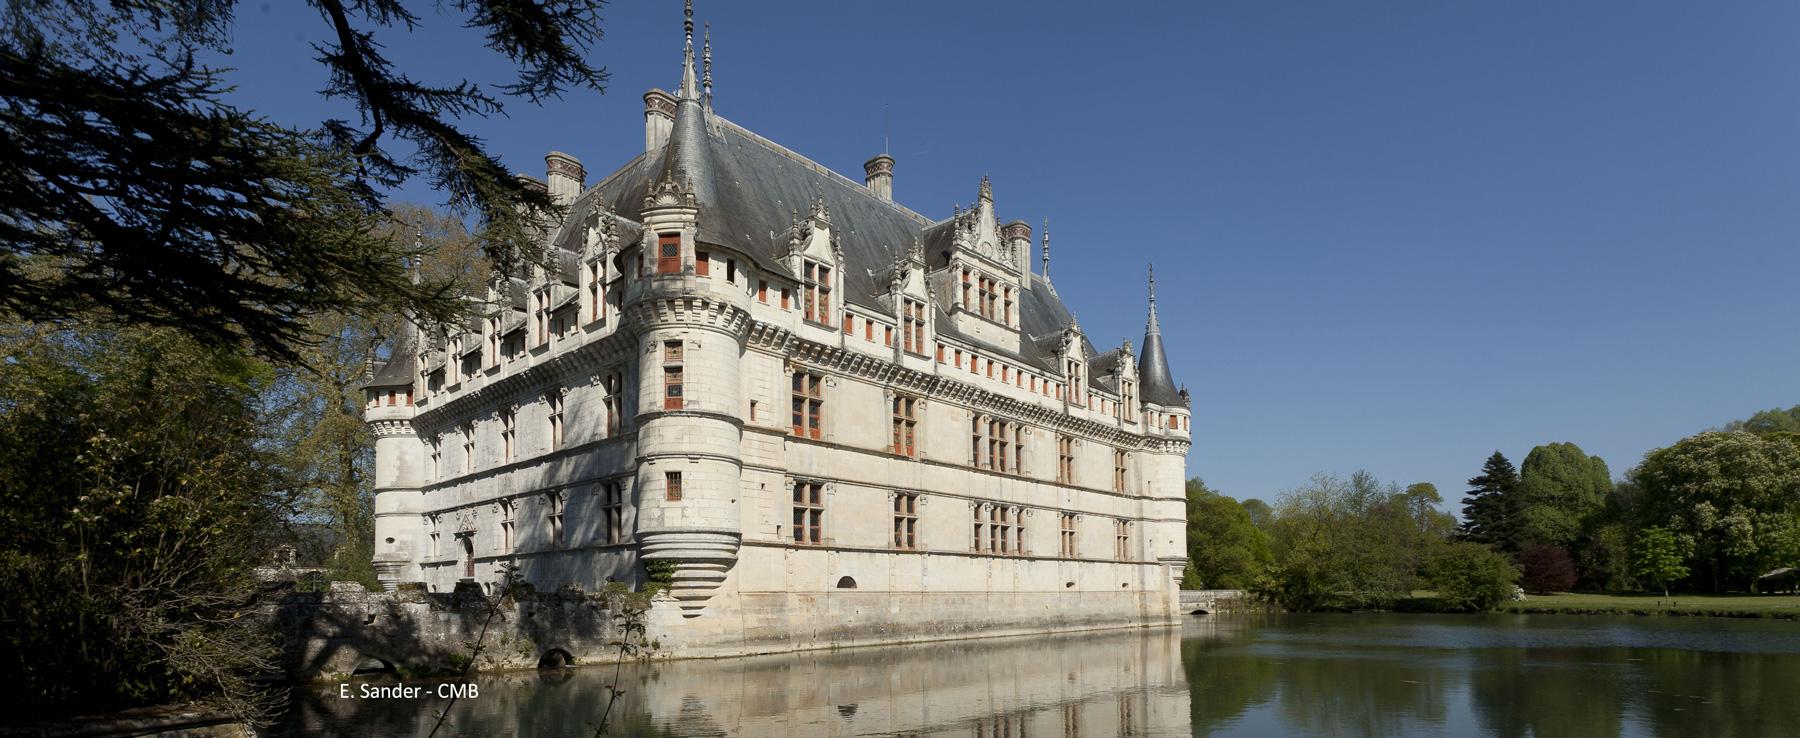 Chateau d'Azay-le-Rideau Villandry, Chenonceau